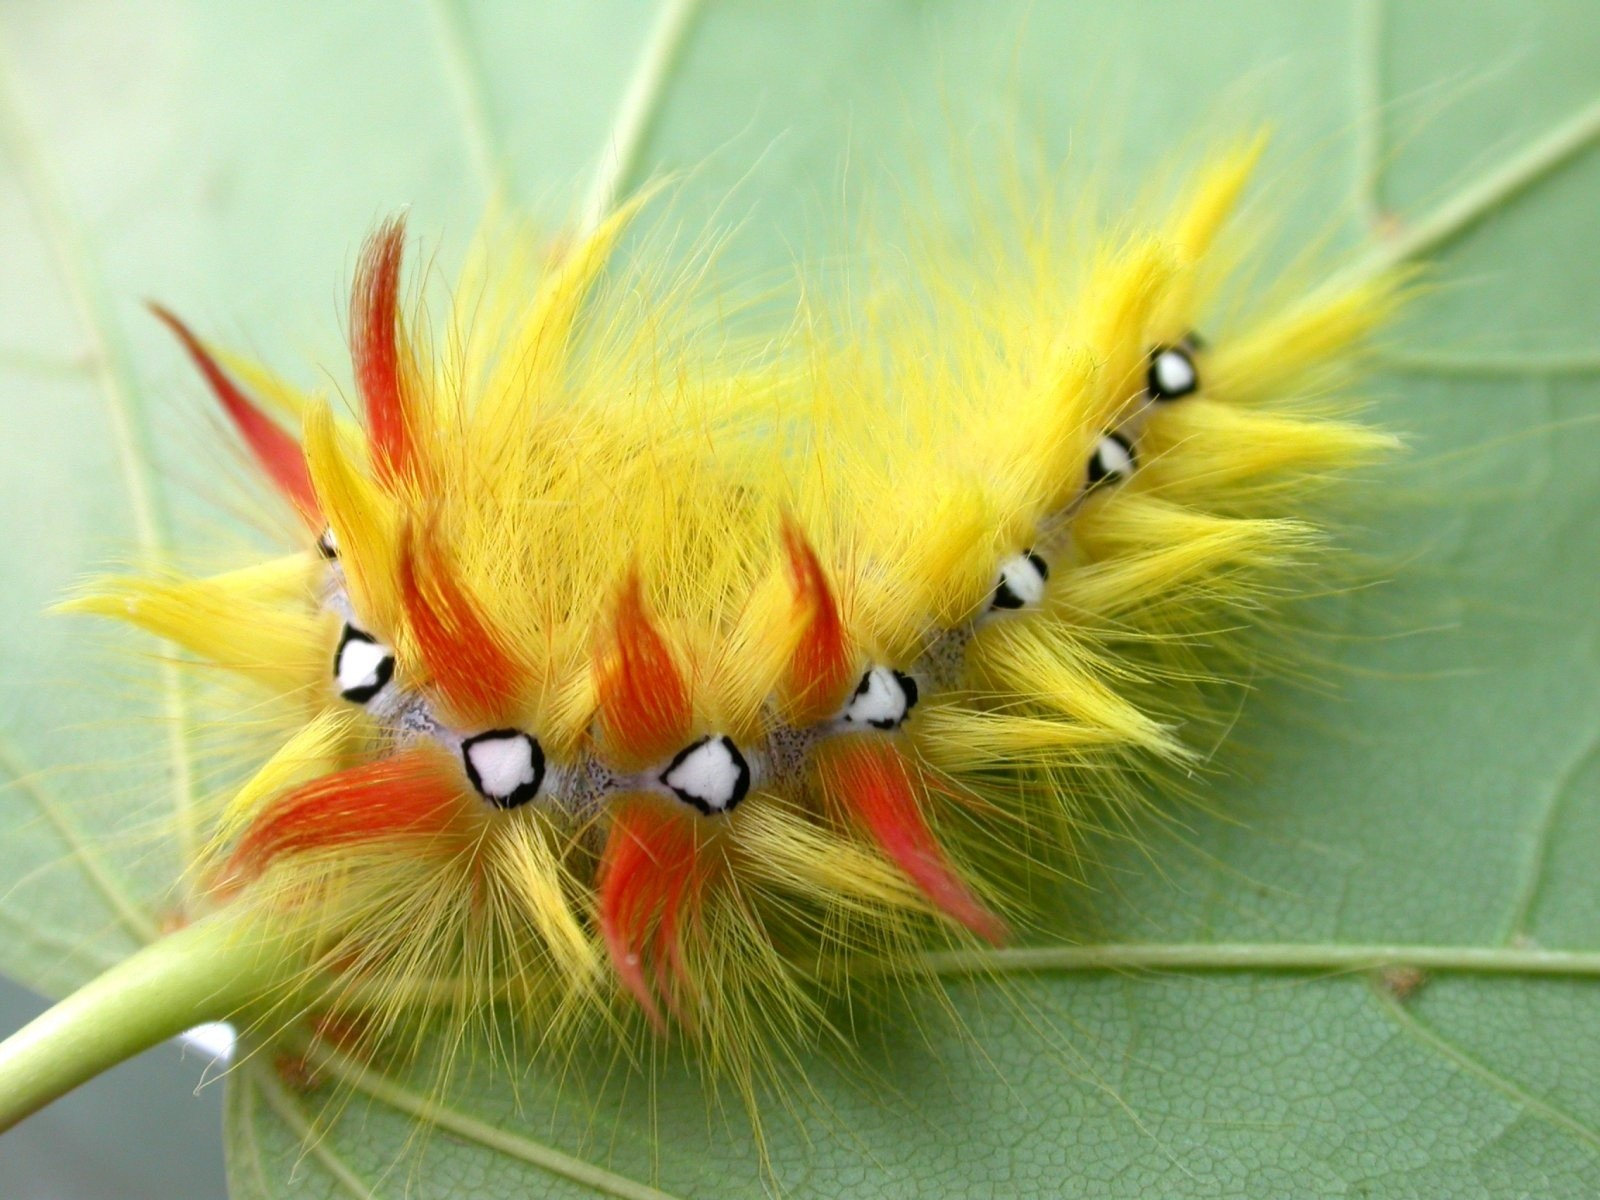 Top 10 Unusual And Amazing Caterpillars